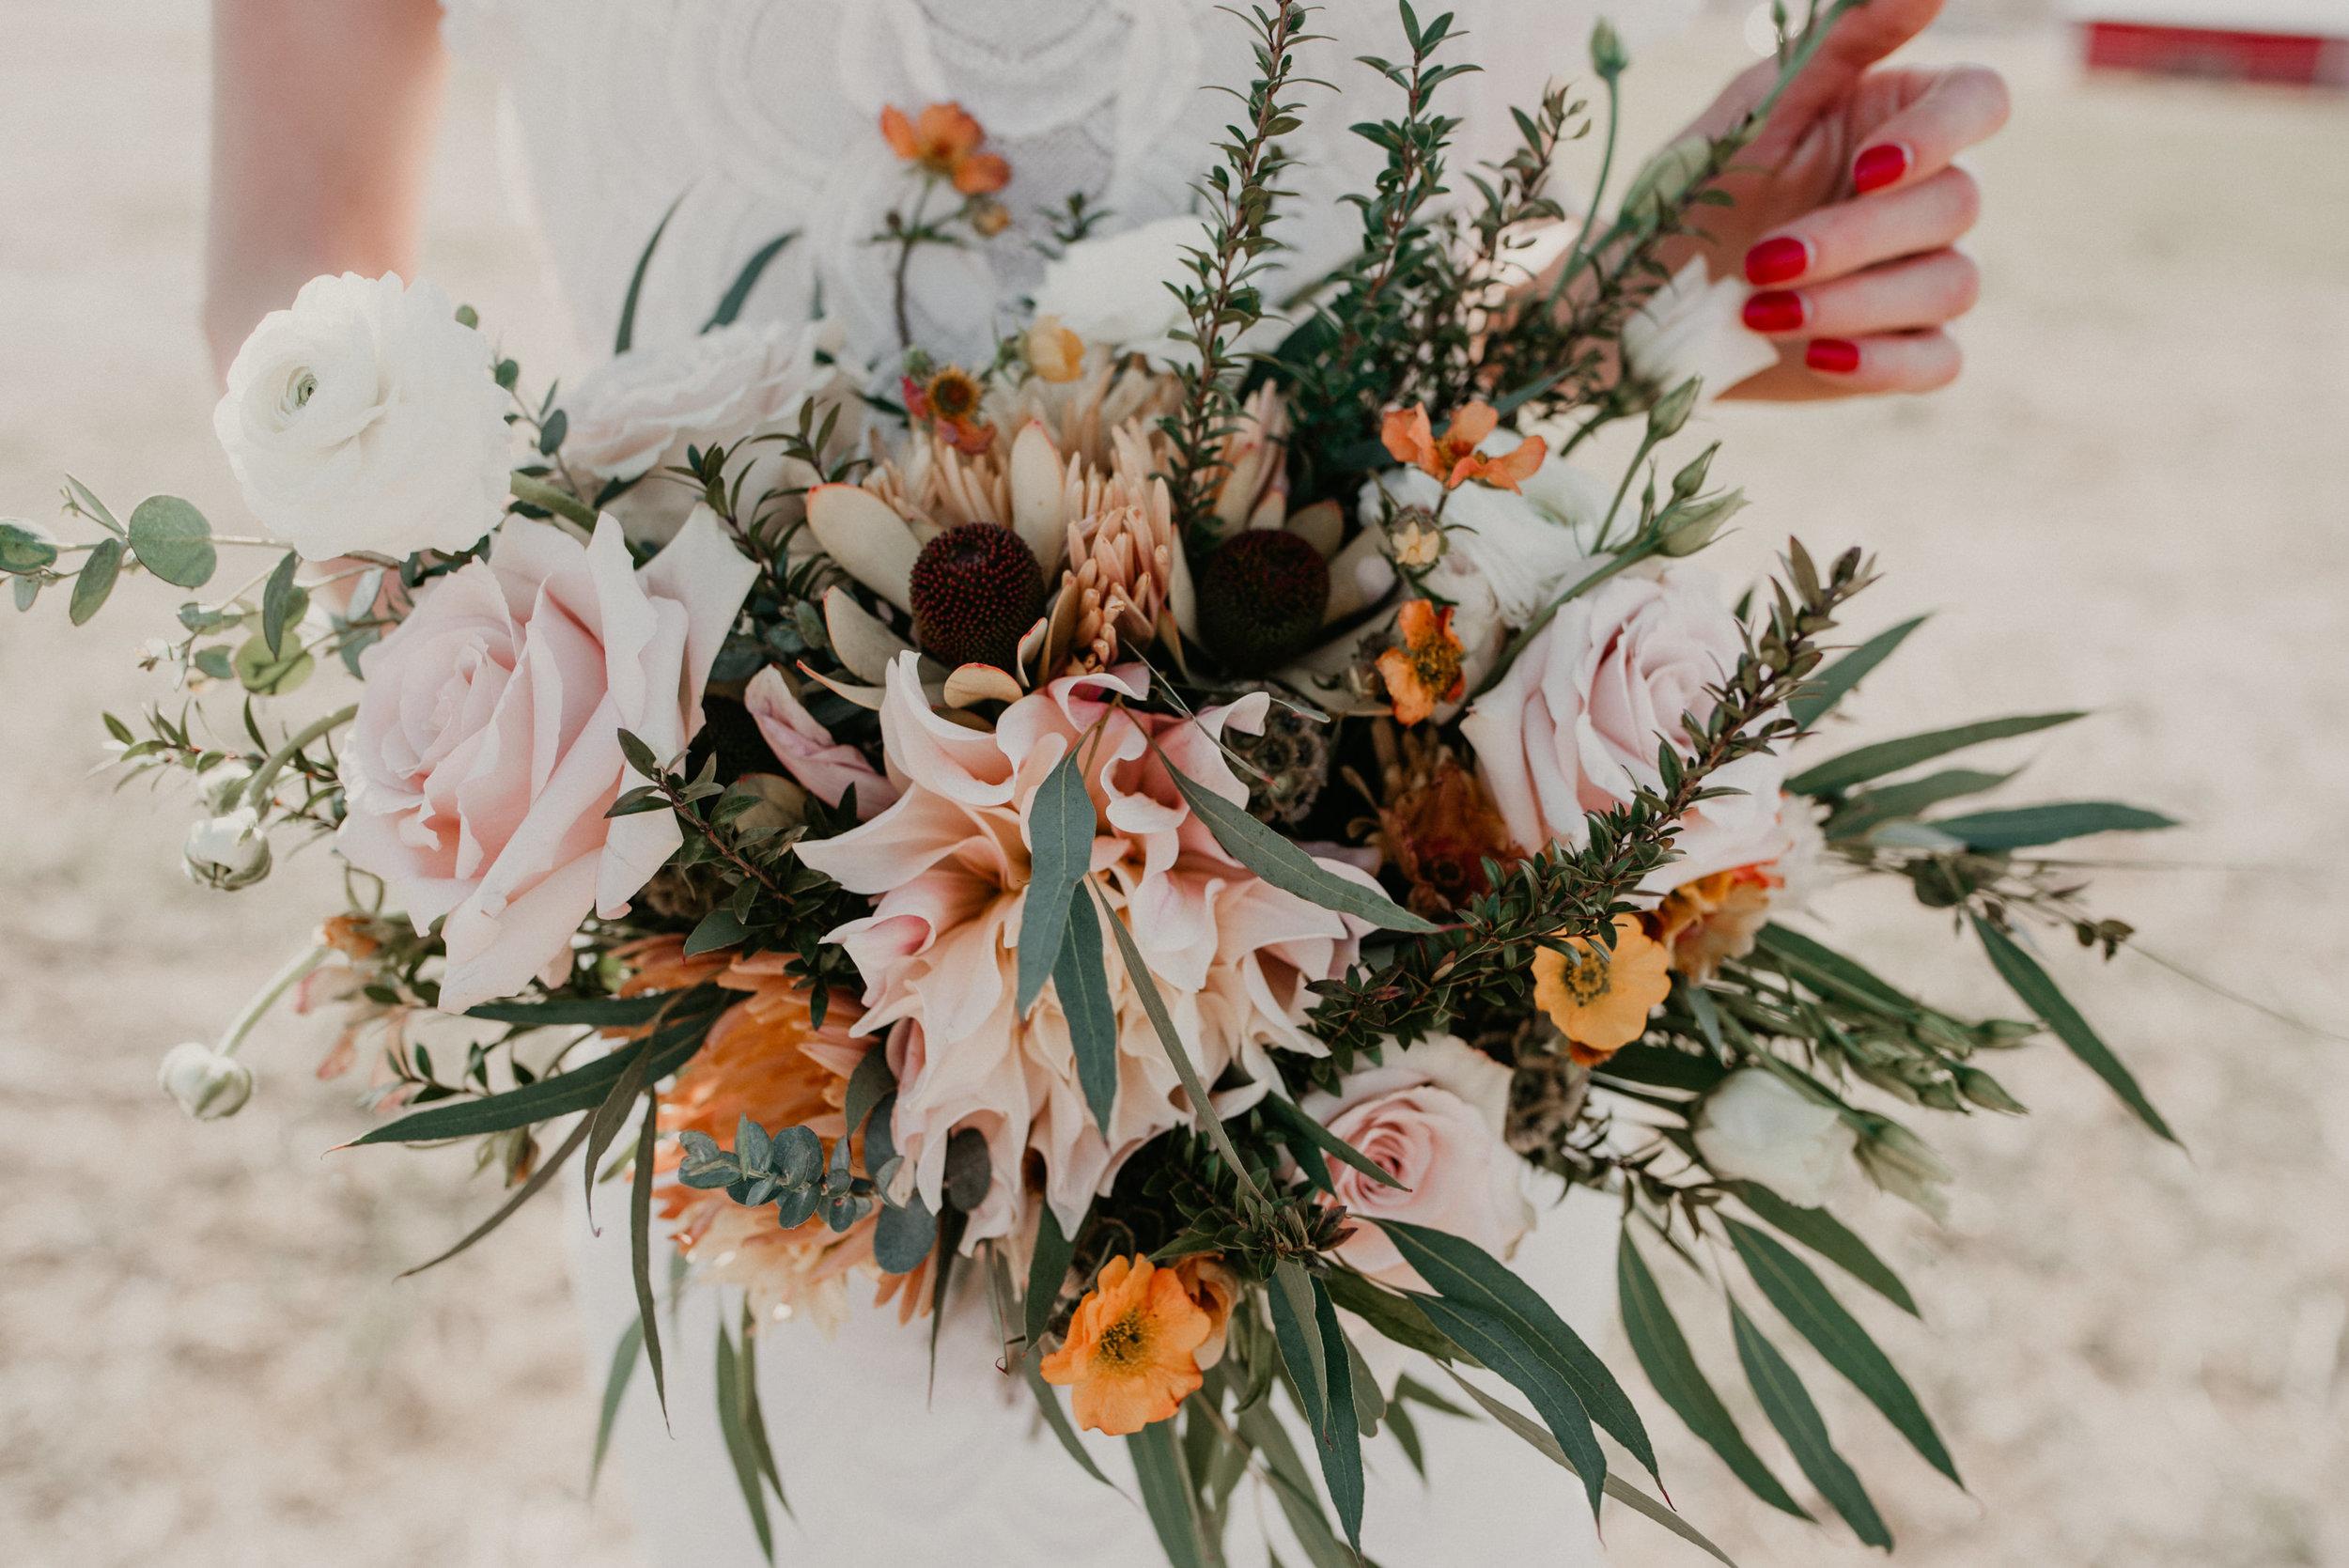 Close up detail of a boho elopement and wedding bouquet.